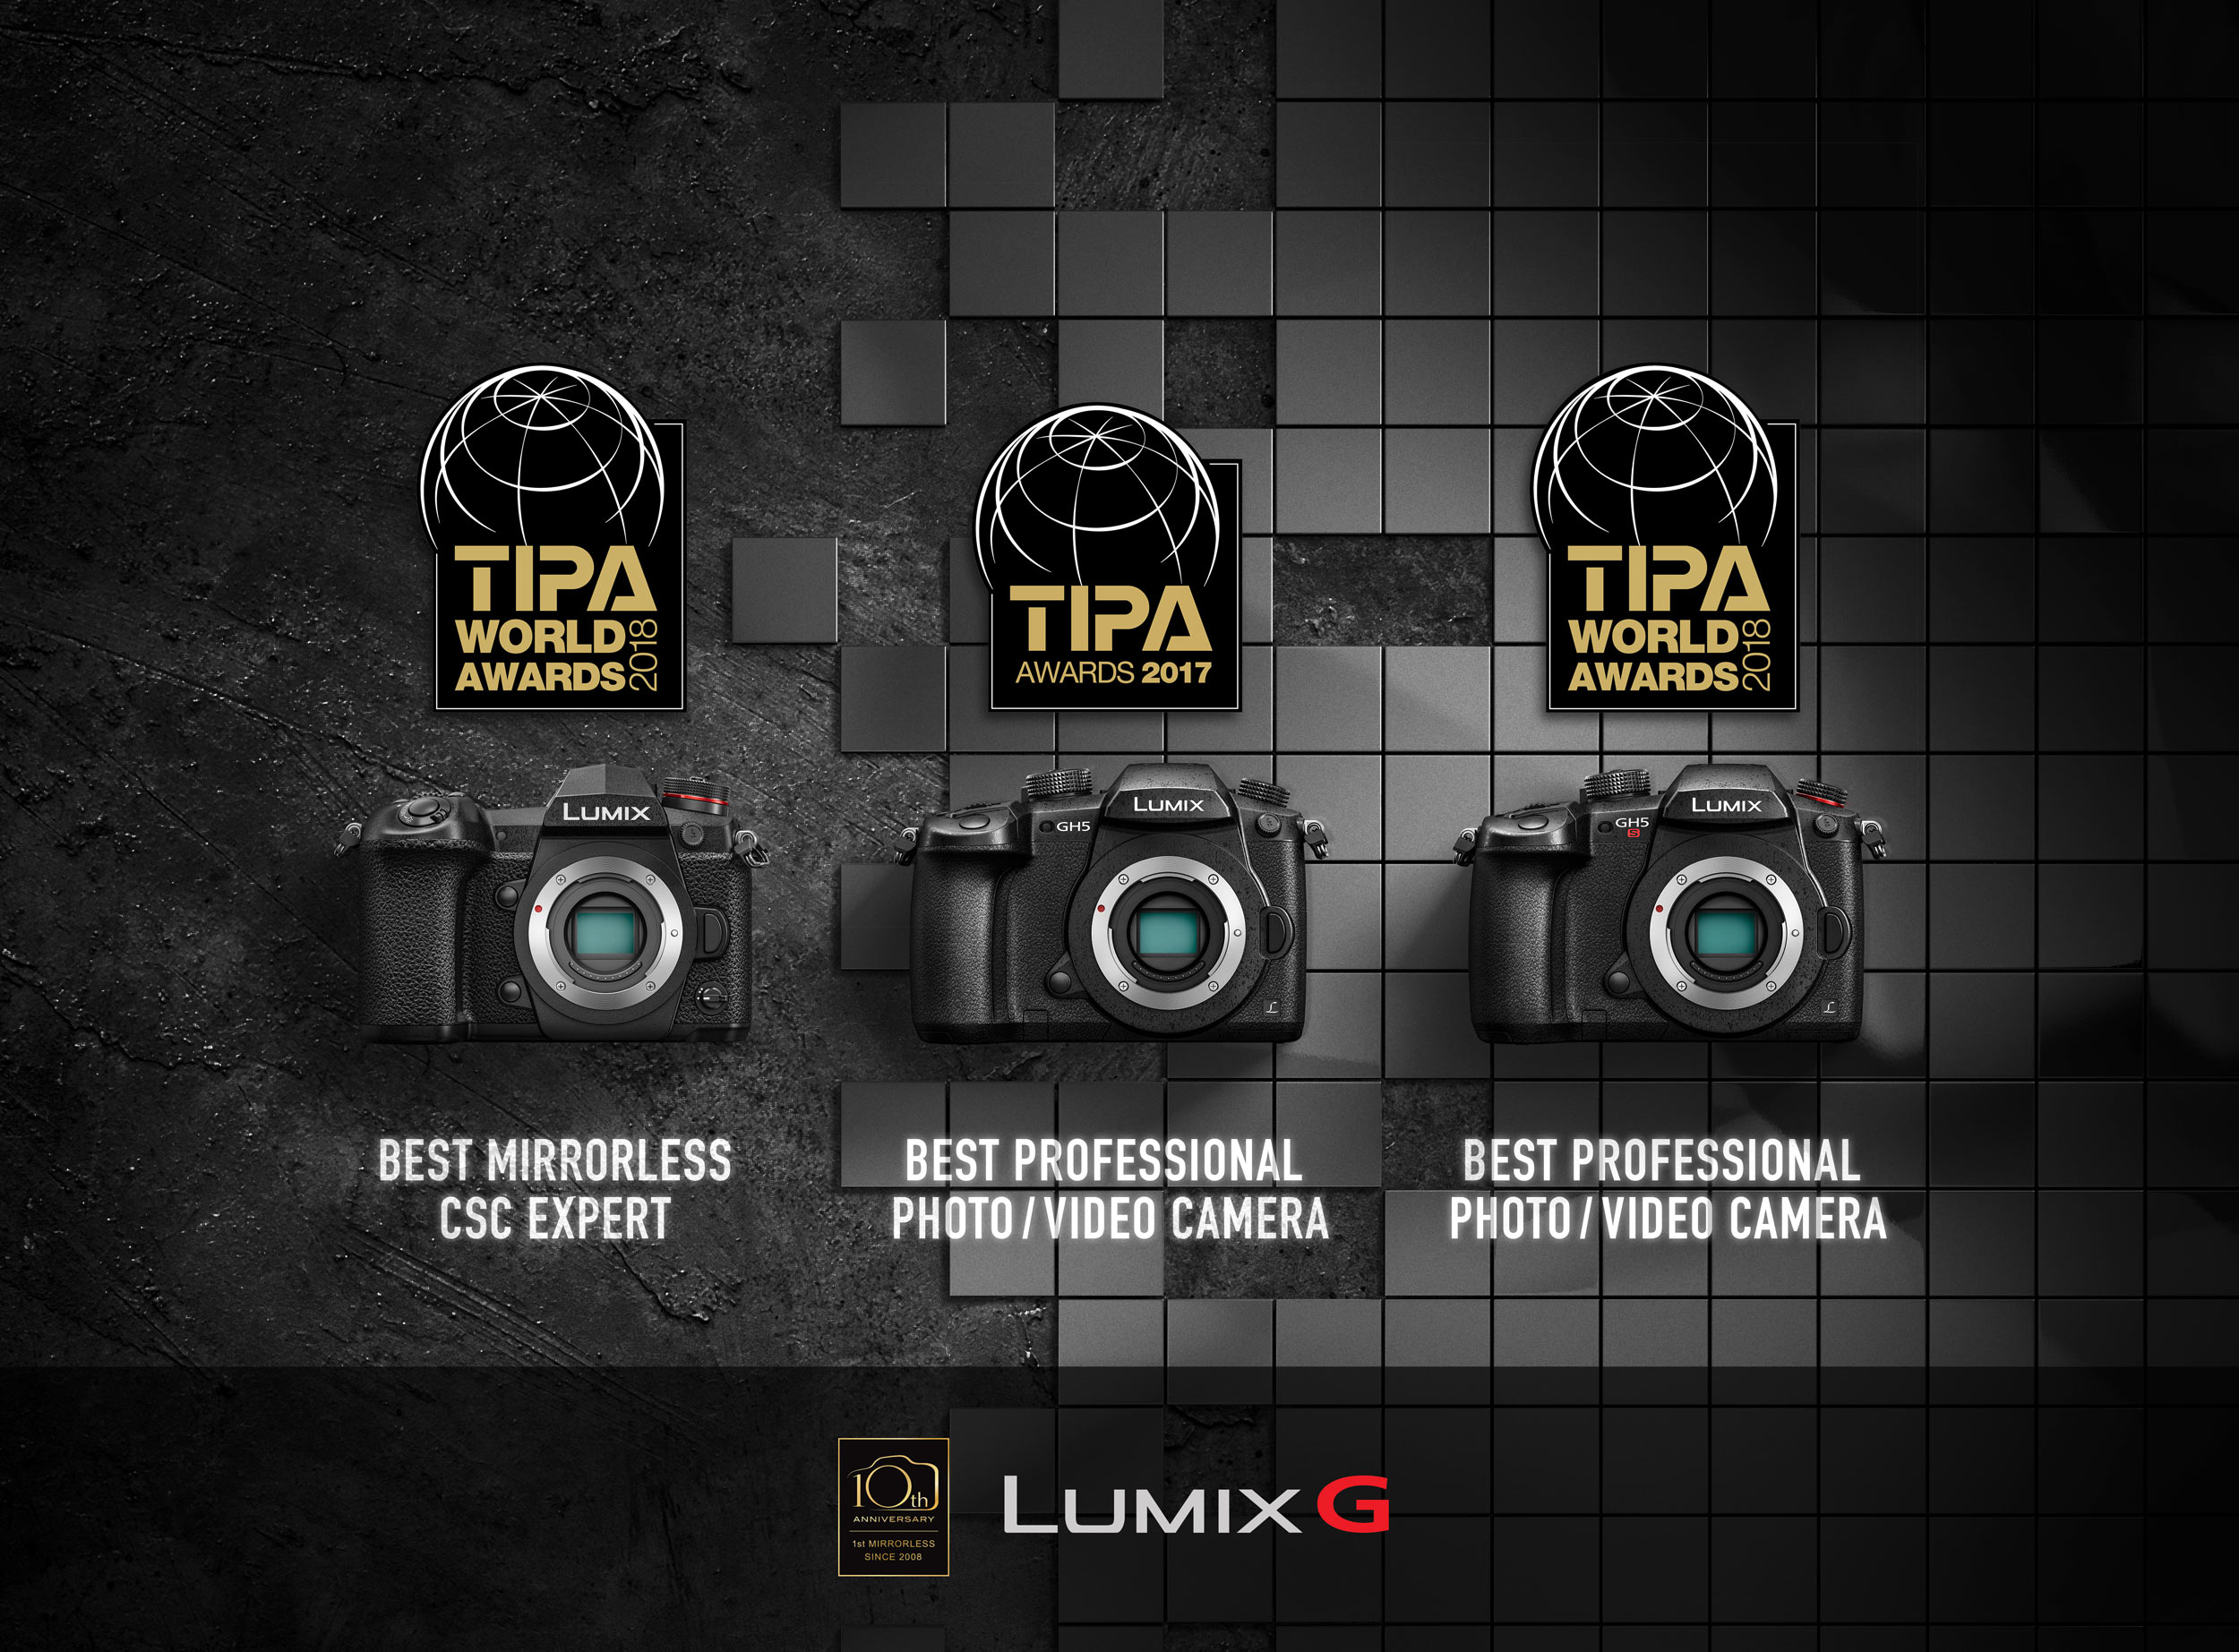 Panasonic gewinnt drei TIPA-Awards